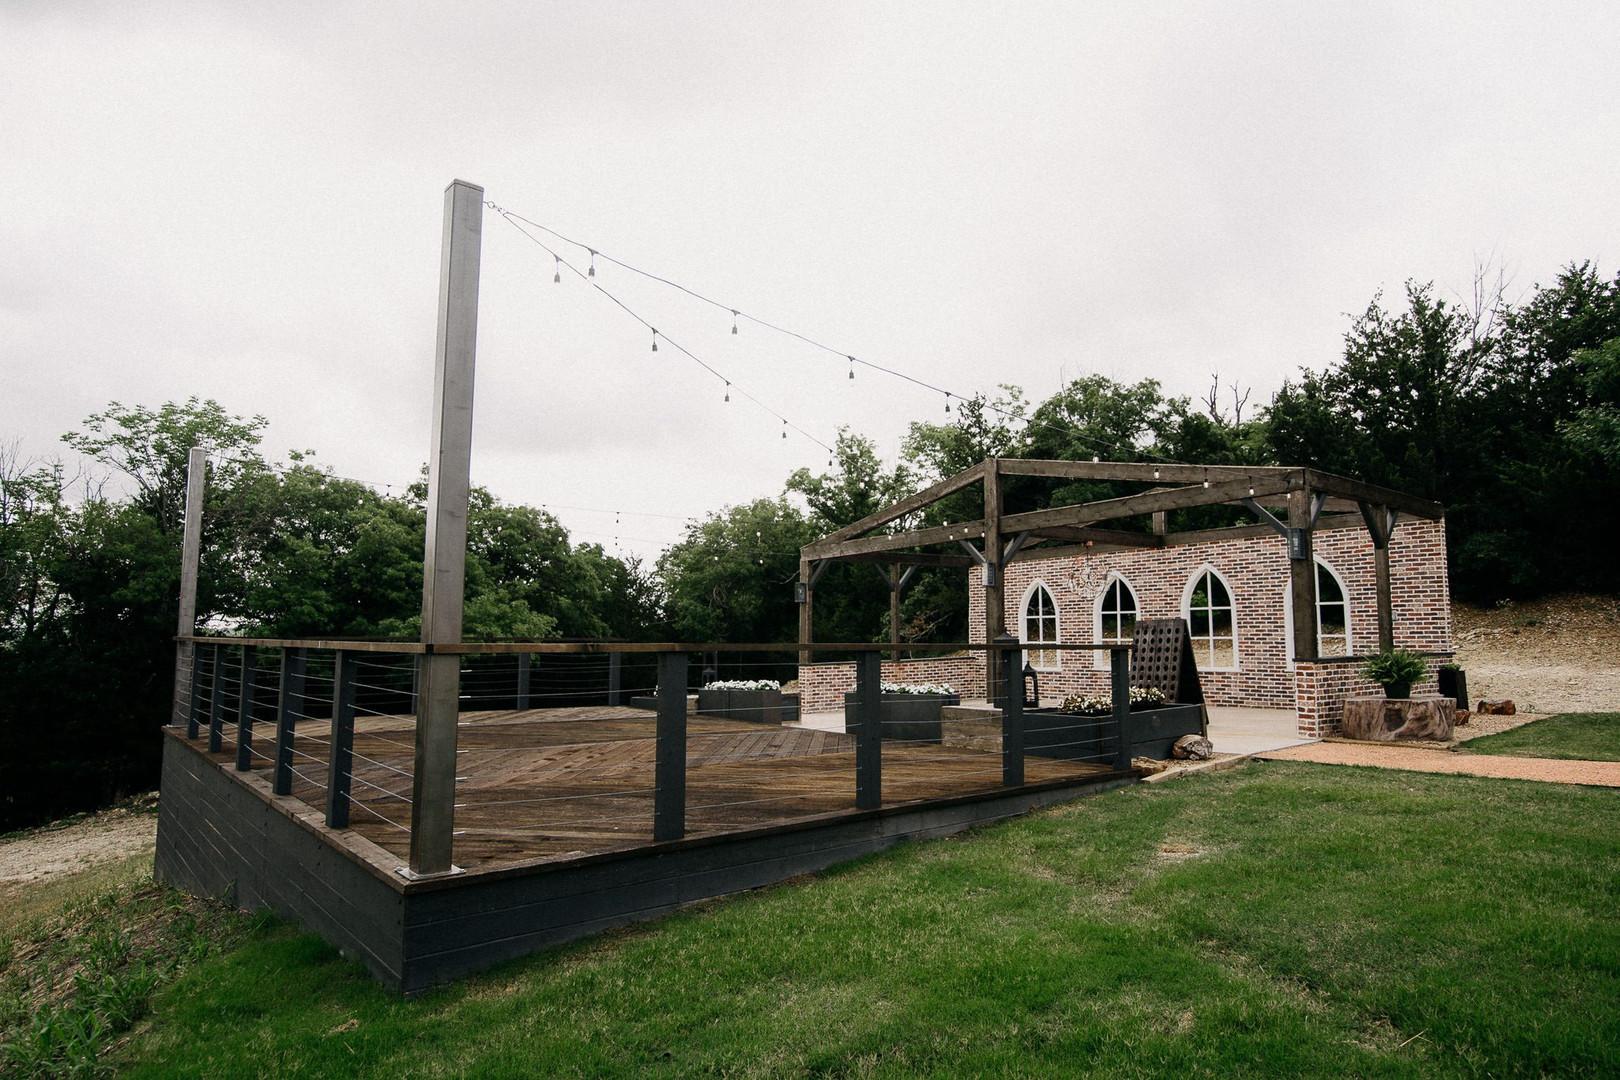 Bethel Rock Viewpoint